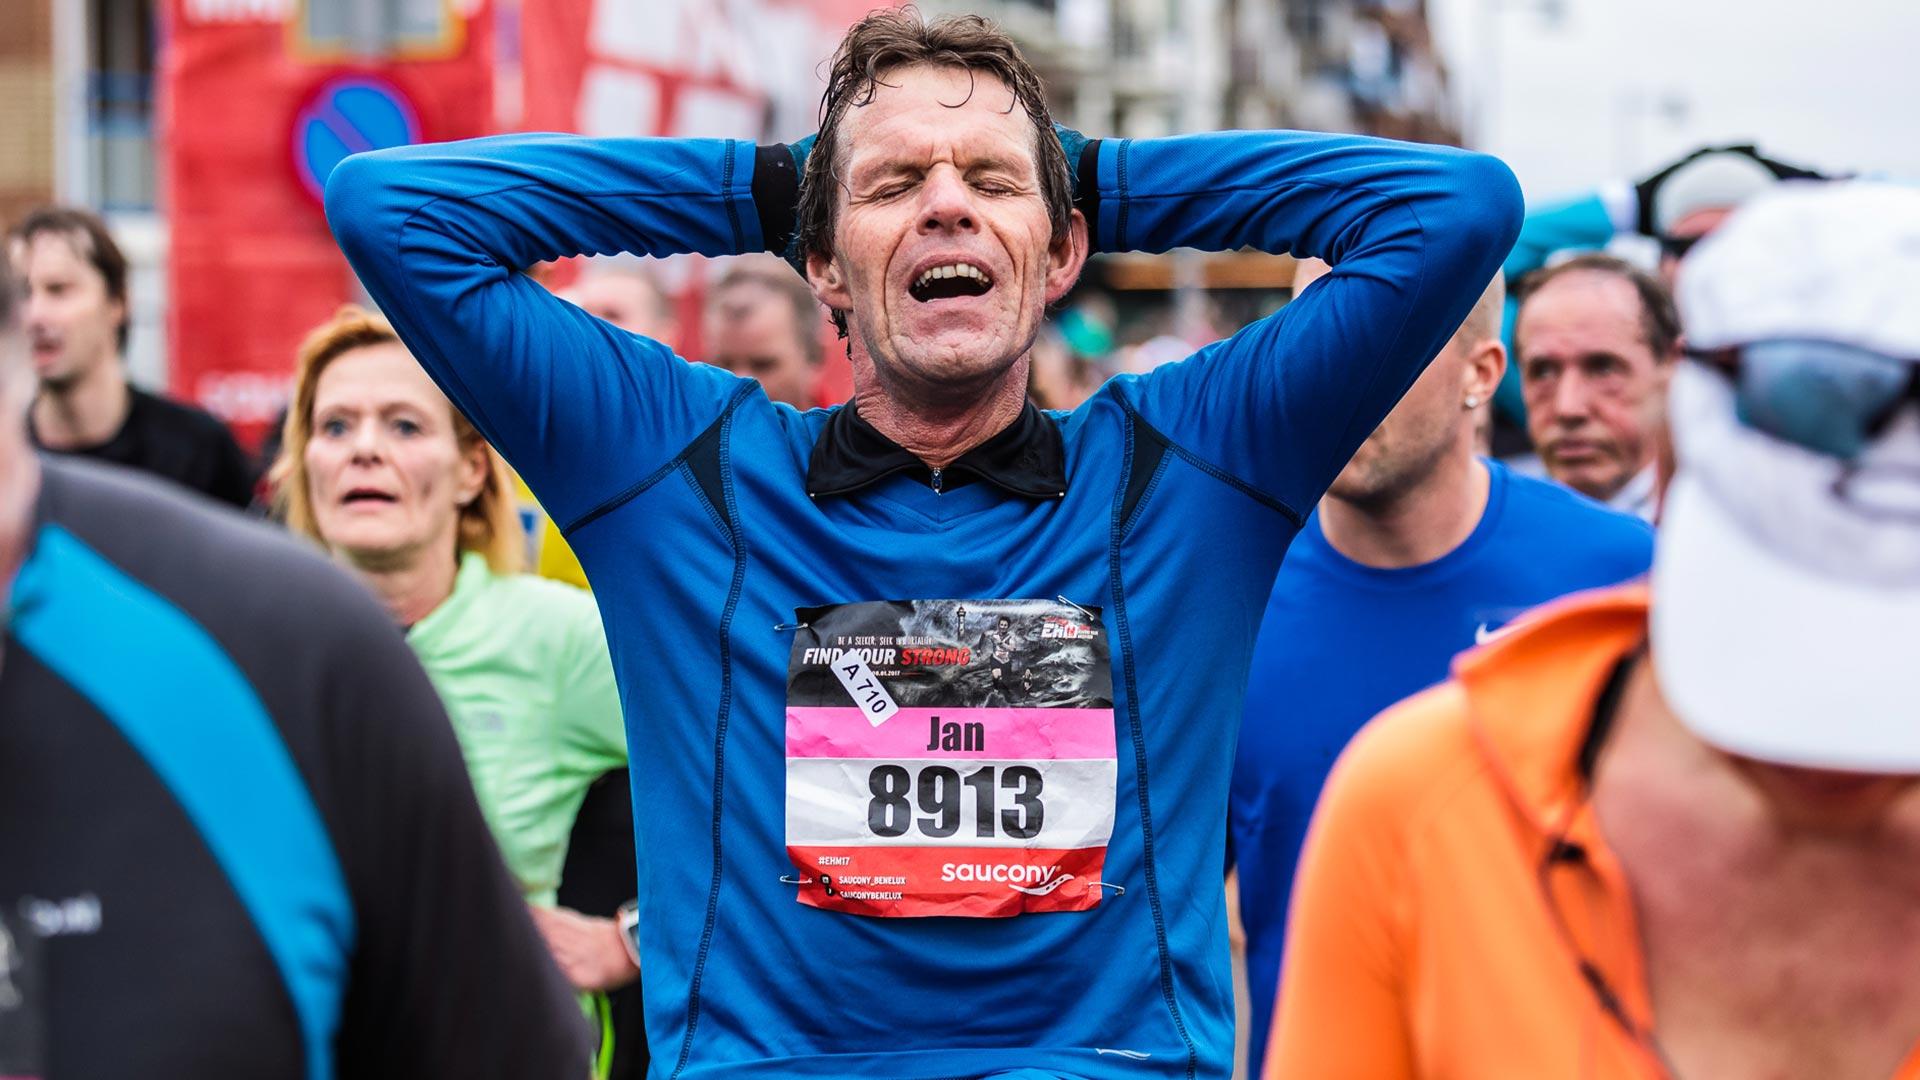 Saucony Egmond Halve Marathon 2017